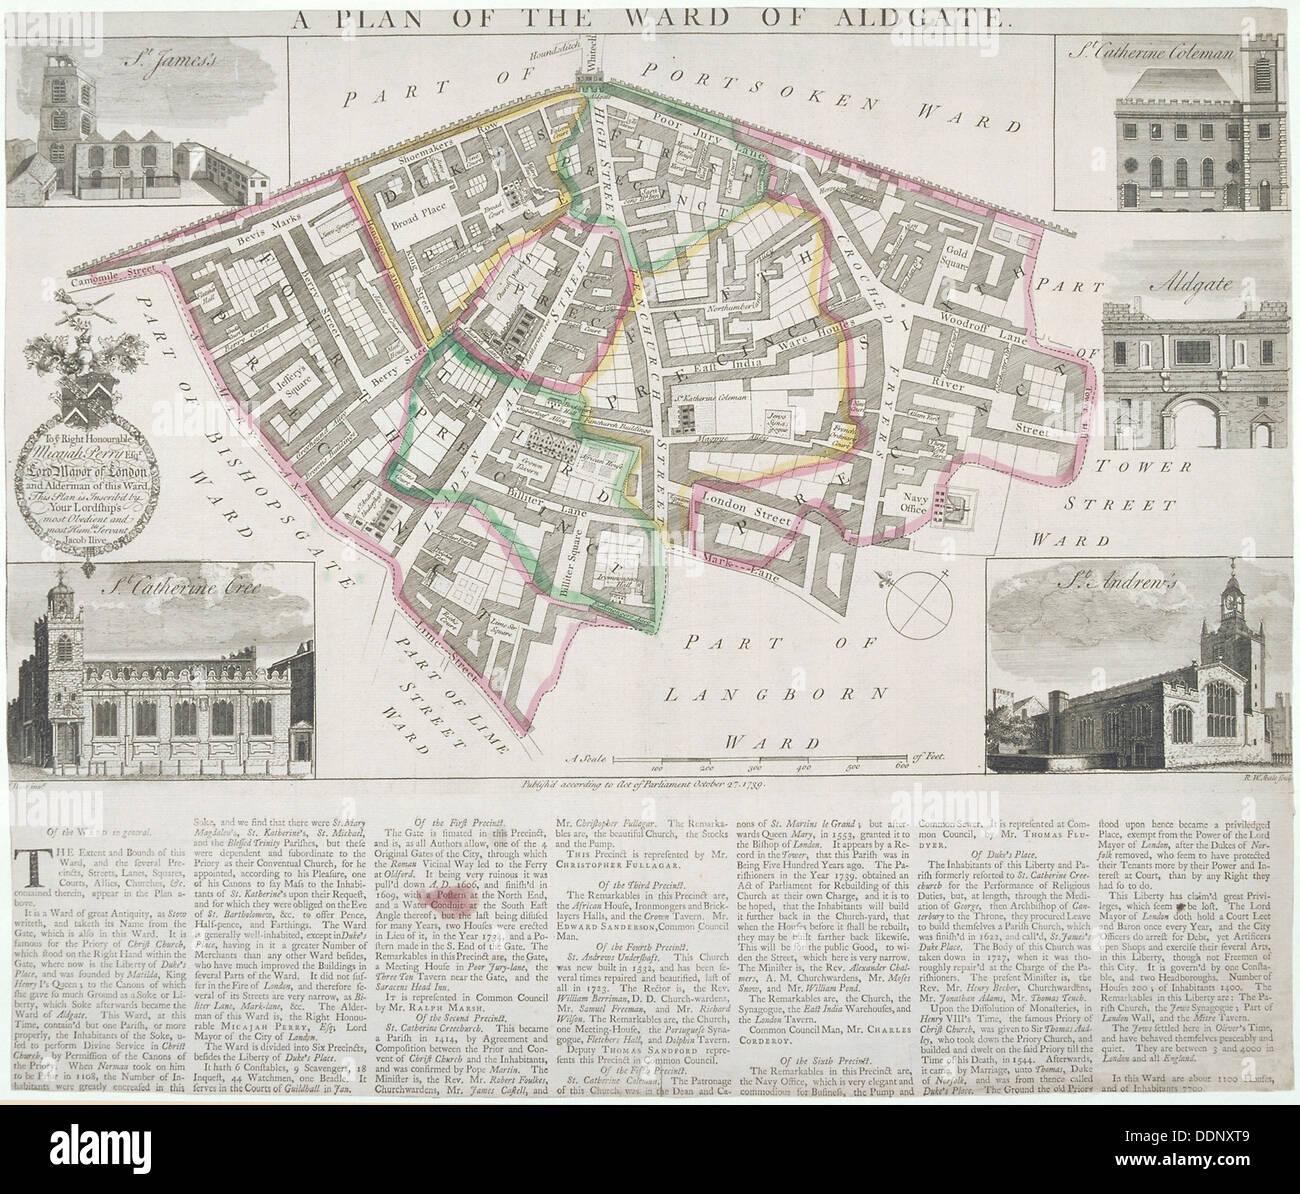 Map of Aldgate Ward, City of London, 1739. Artist: RW Seale - Stock Image